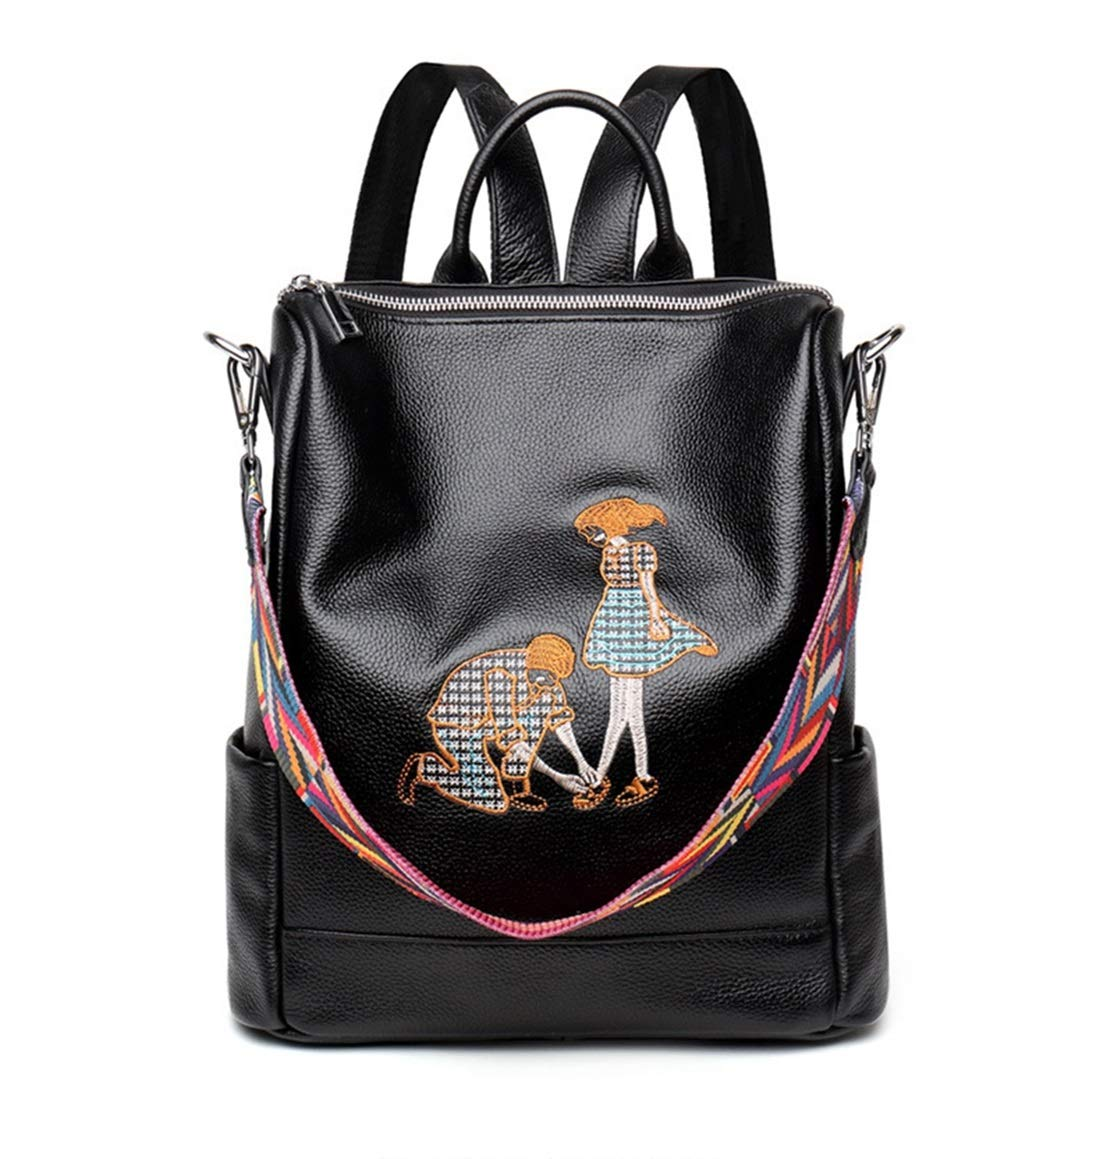 Vergeania レディース刺繍プリントバックパック大容量ポータブルハンドバッグショルダートートバッグ用女の子バックパック (色 : 黒) B07S2GBJ65 黒